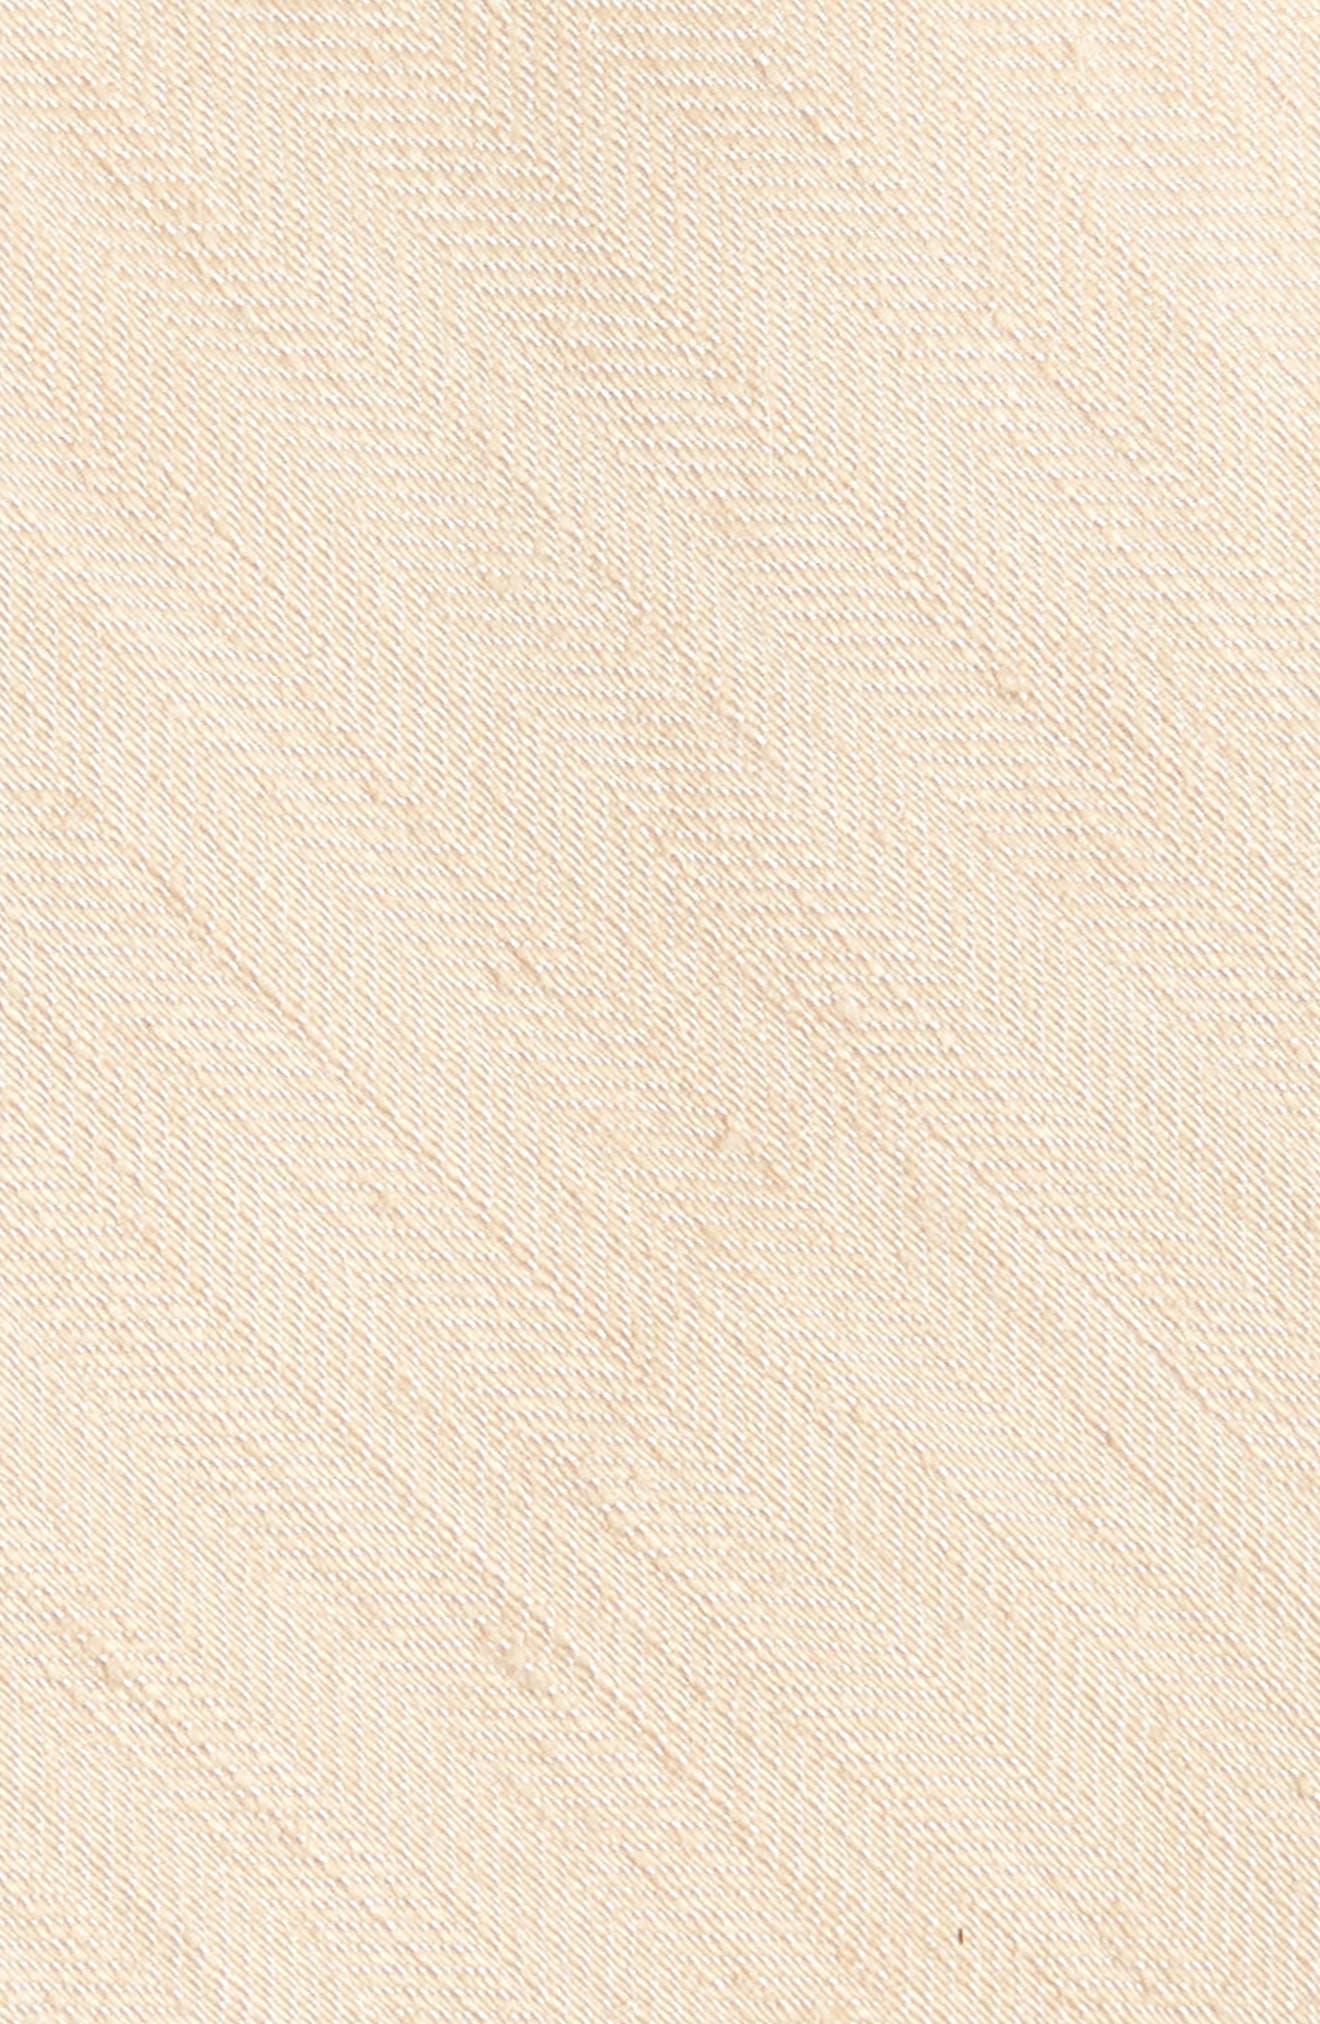 Alternate Image 2  - The Tie Bar Linen Row Linen & Silk Tie (X-Long)